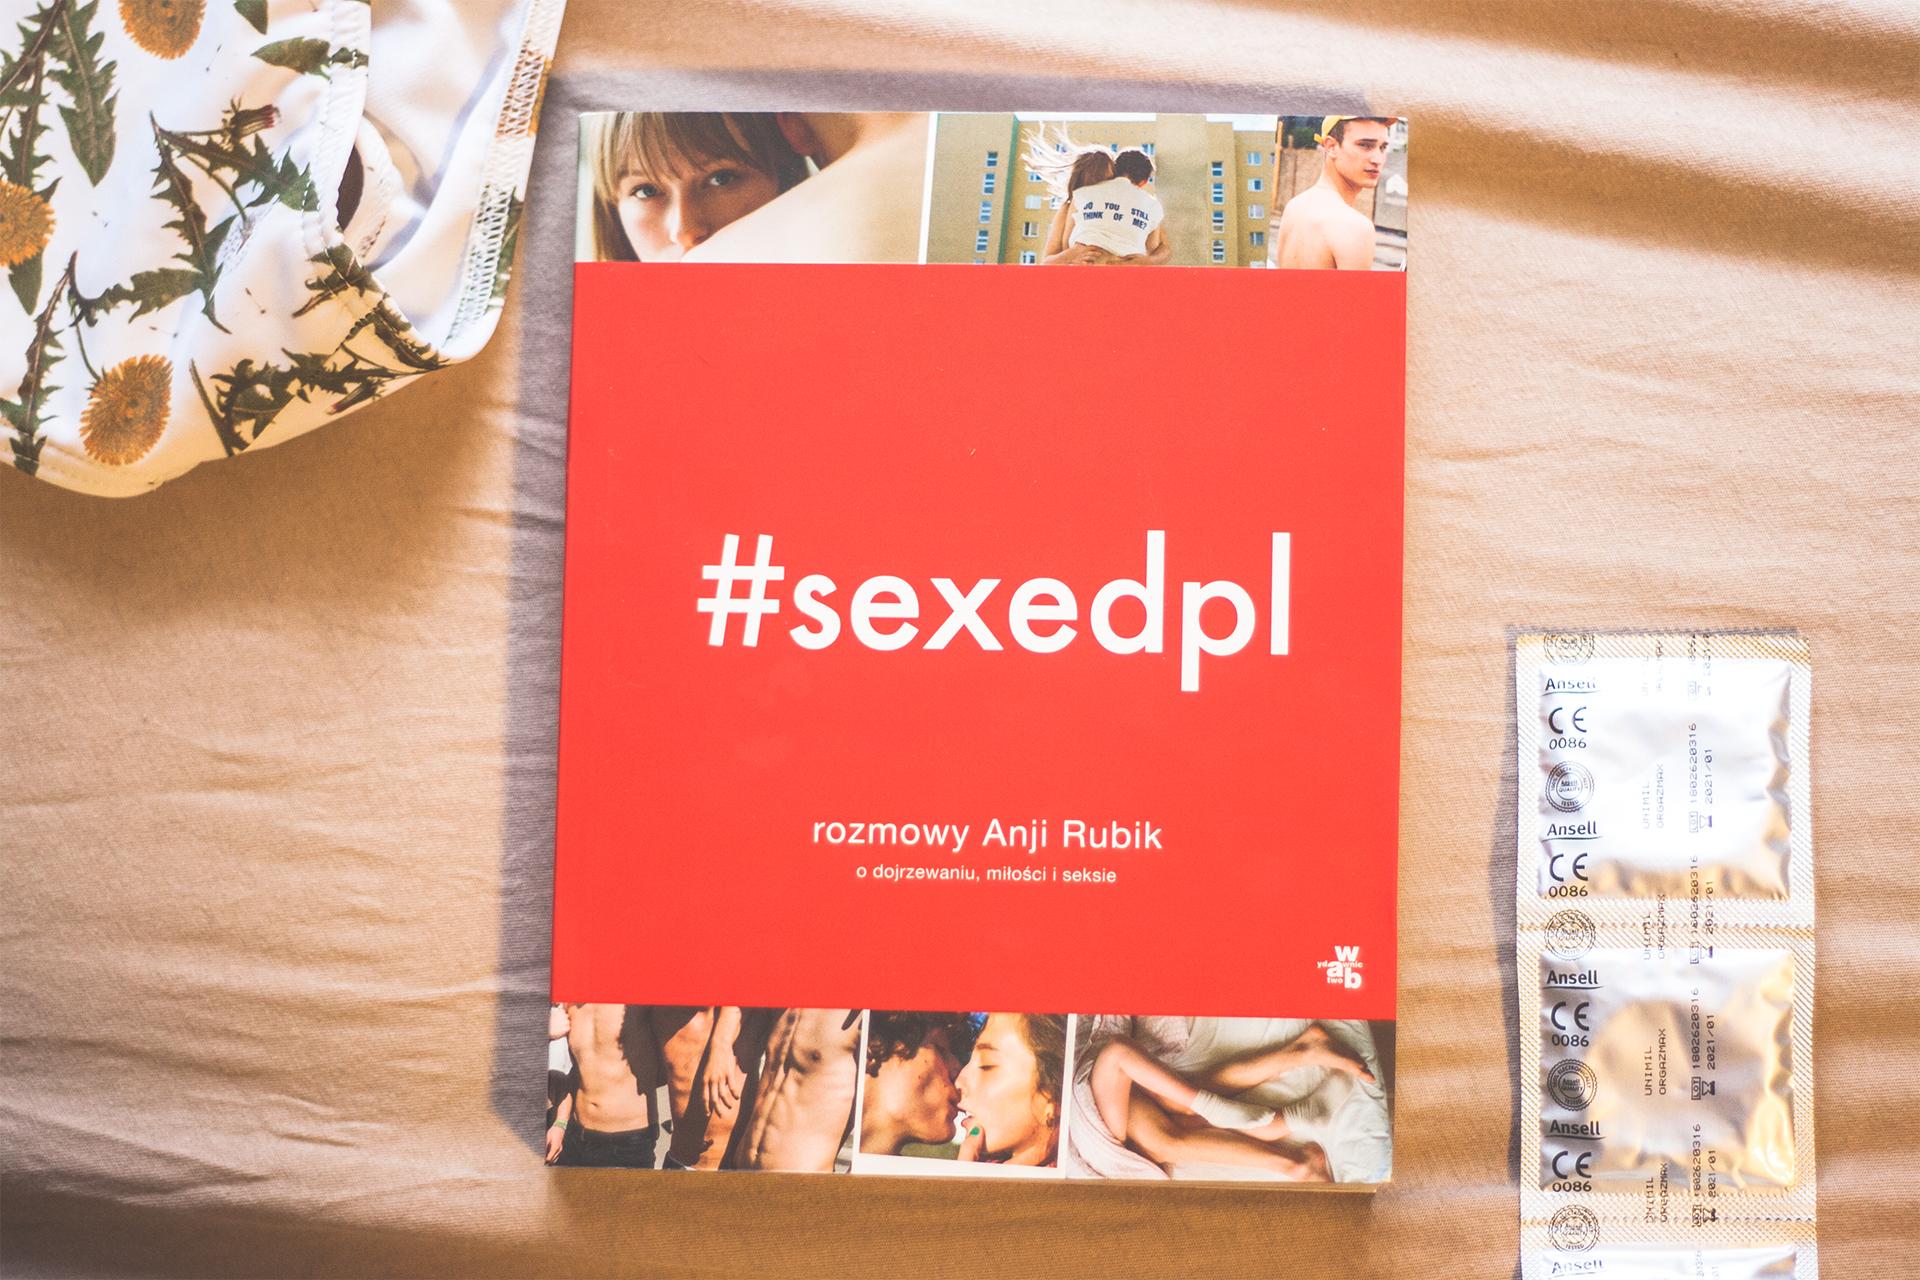 sexed3 - #sexedpl. Właśnie o to pytają nastolatki